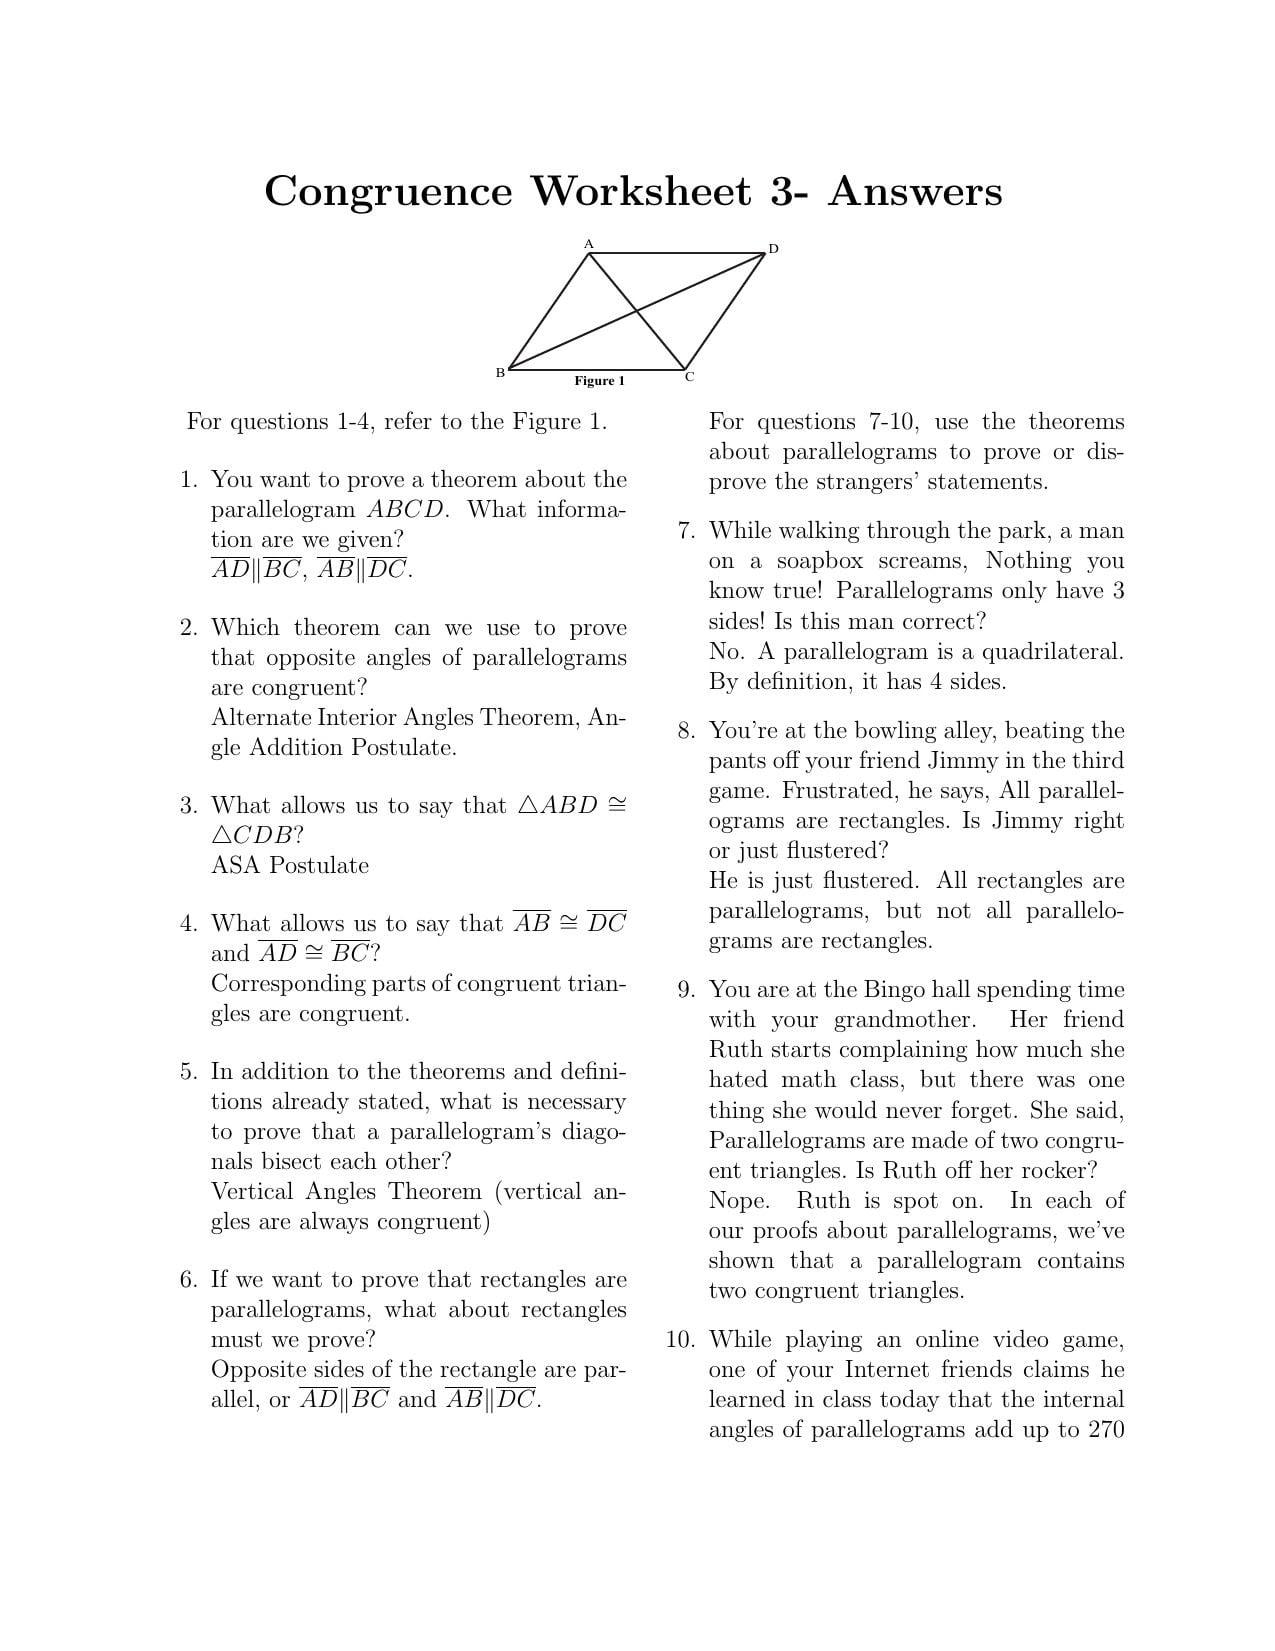 Parallelogram Proofs Worksheet